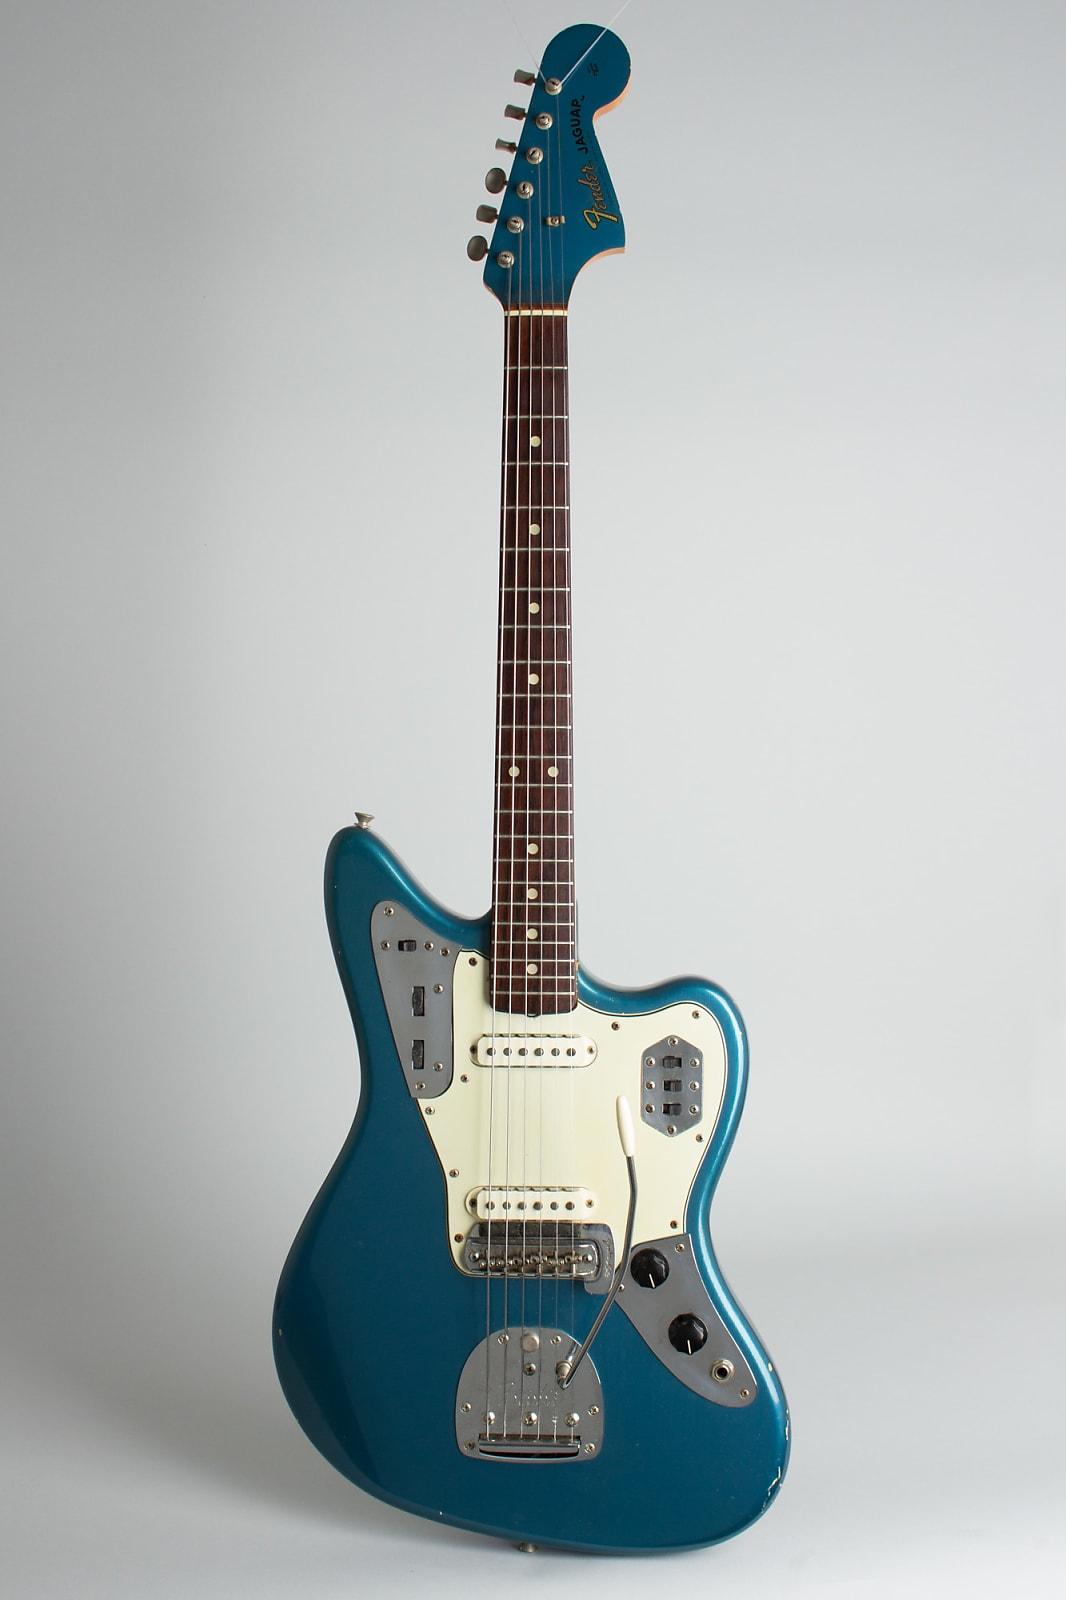 Fender  Jaguar Solid Body Electric Guitar (1964), ser. #L41597, original black tolex hard shell case.